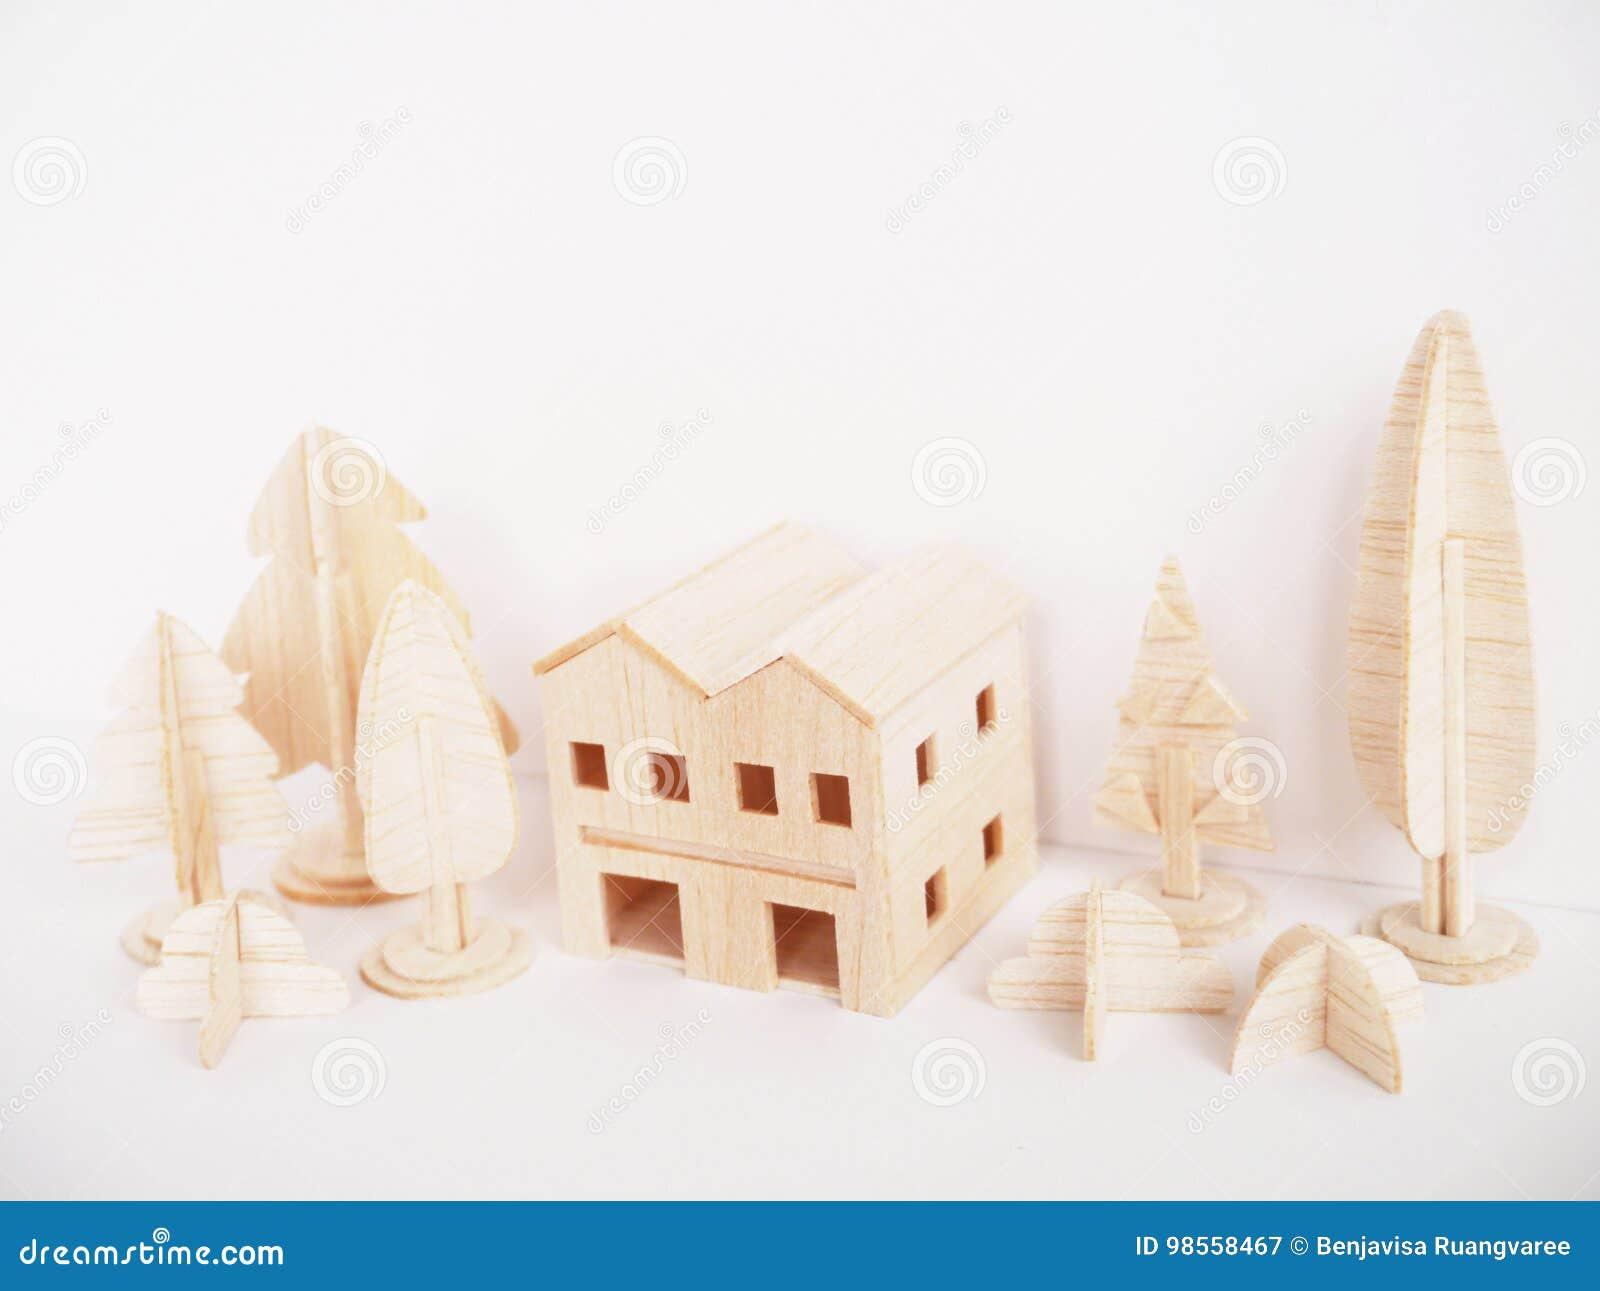 Miniature wooden model cutting artwork craft handmade minimal